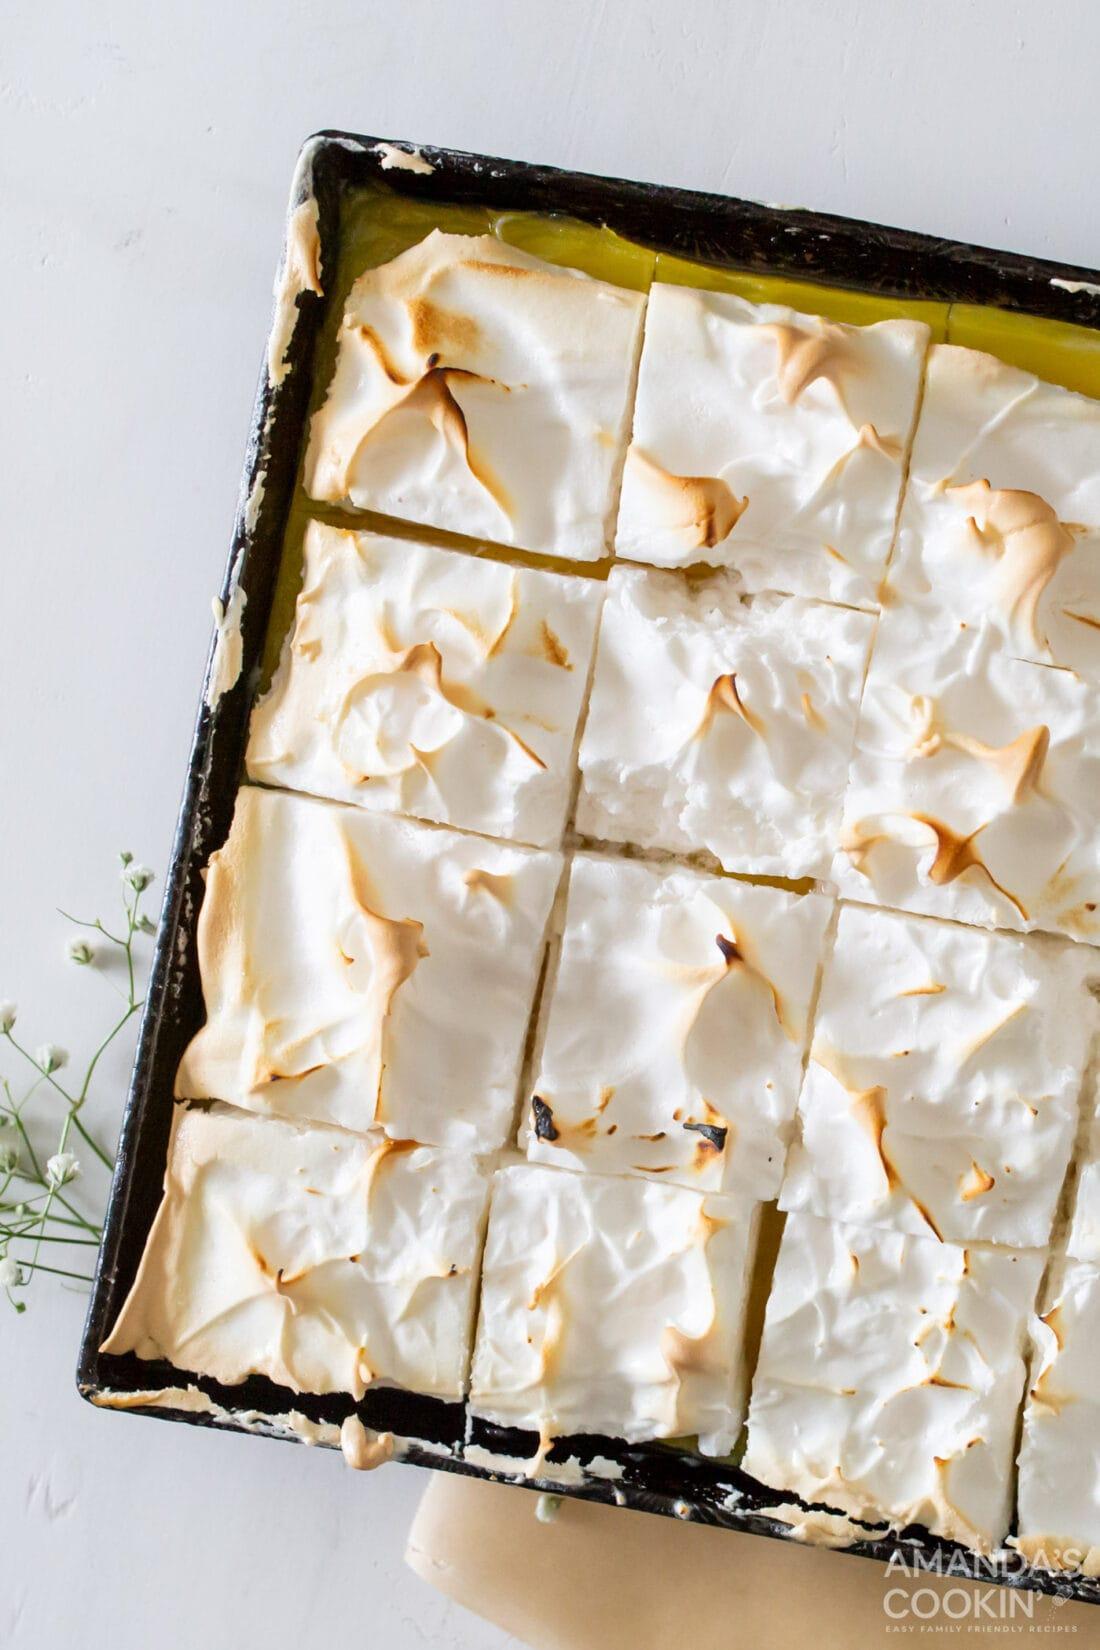 pan of Lemon Meringue Pie Bars cut into squares